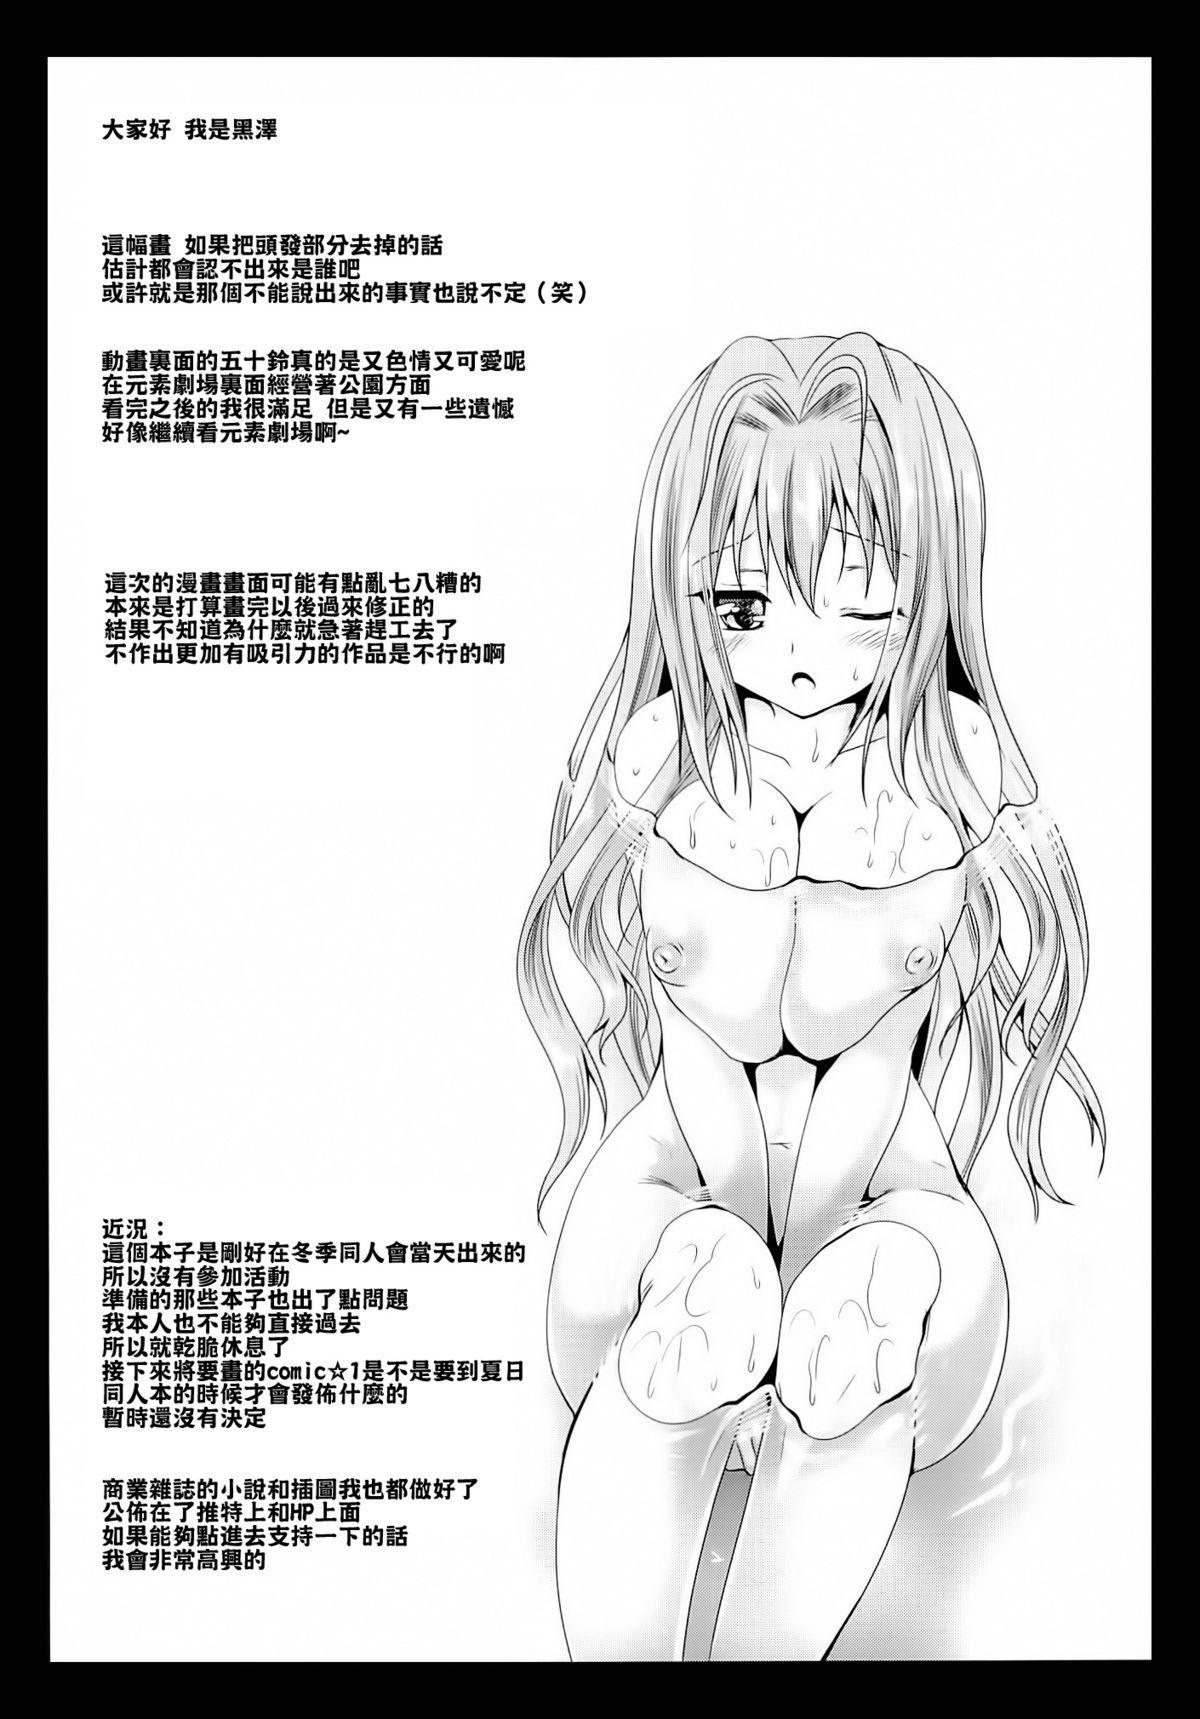 Sento Isuzu Cast Funtouki 24